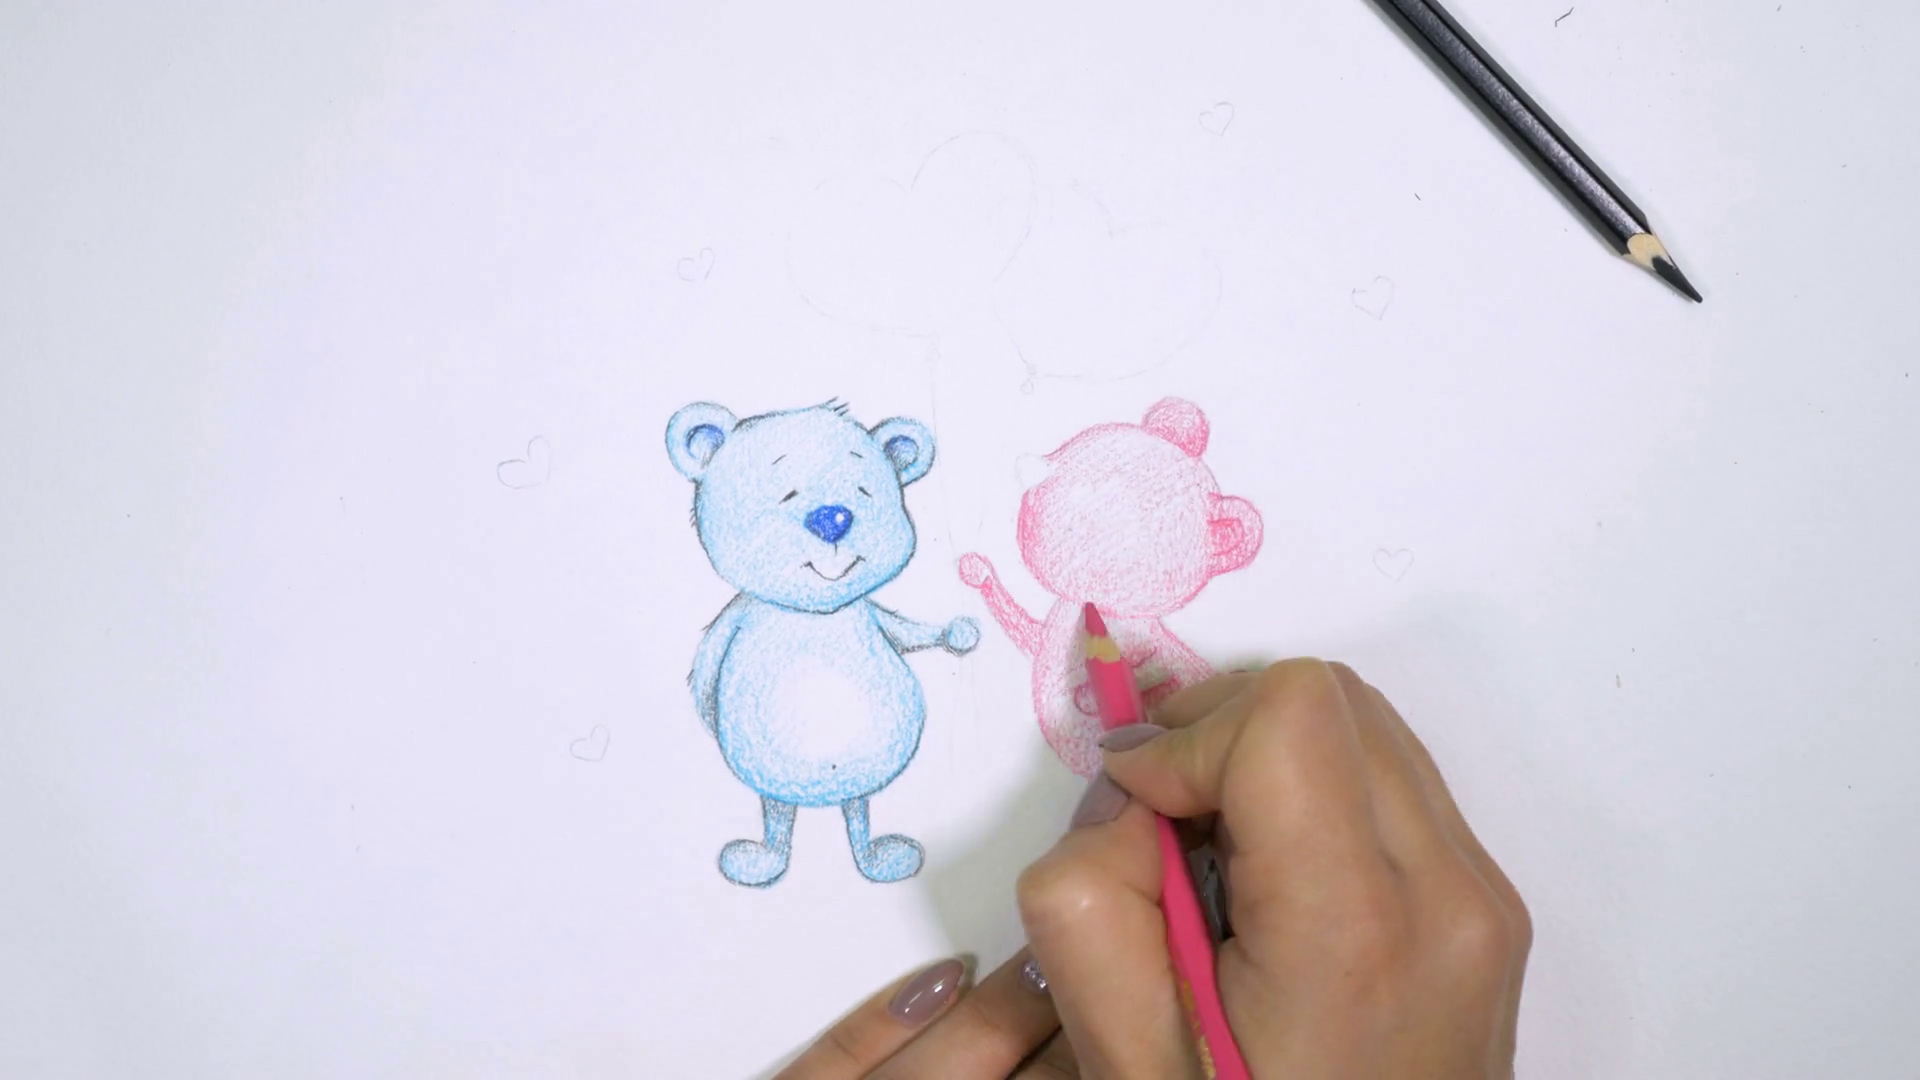 1920x1080 Valentine's Day. Beautiful, Cute, Lovely Teddy Bears In Love